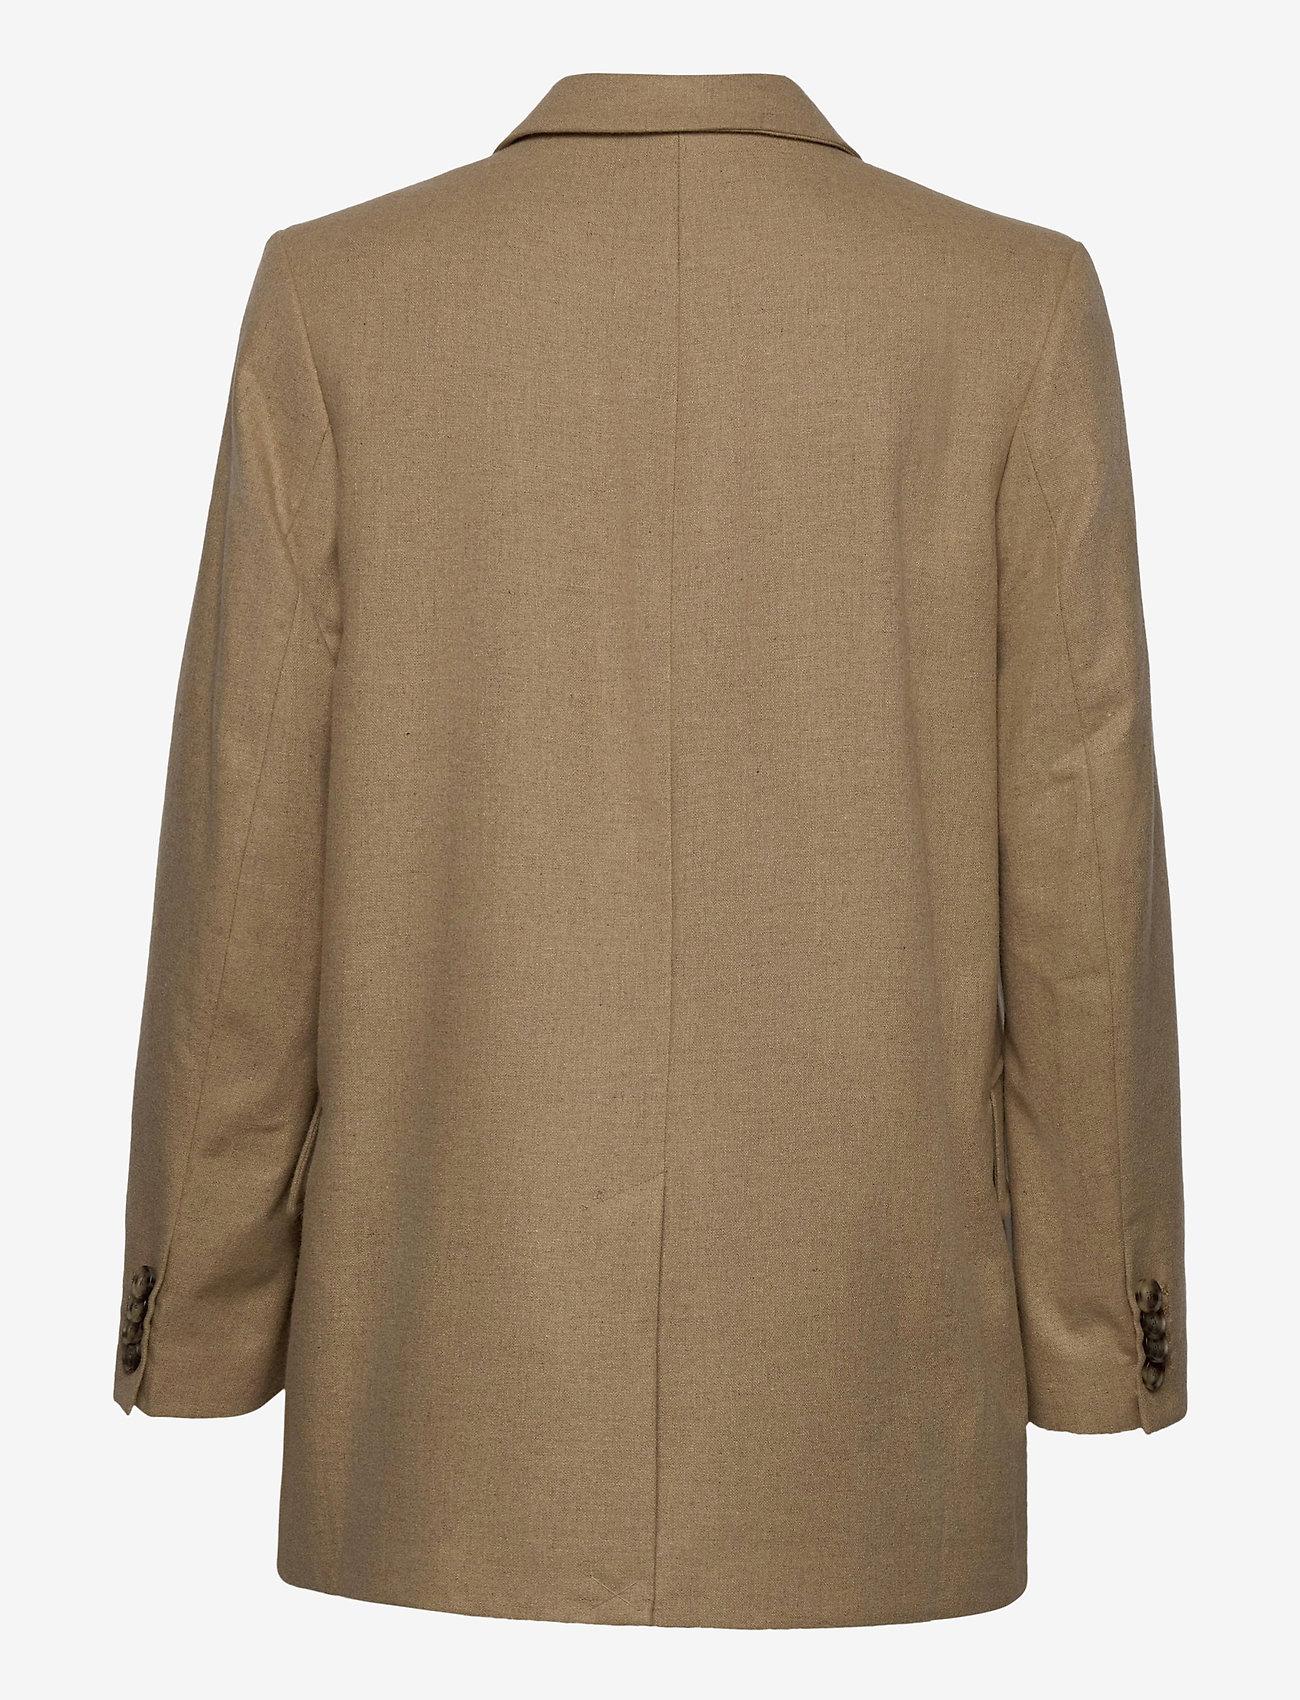 Wood Wood - Anna jacket - wool jackets - khaki - 1